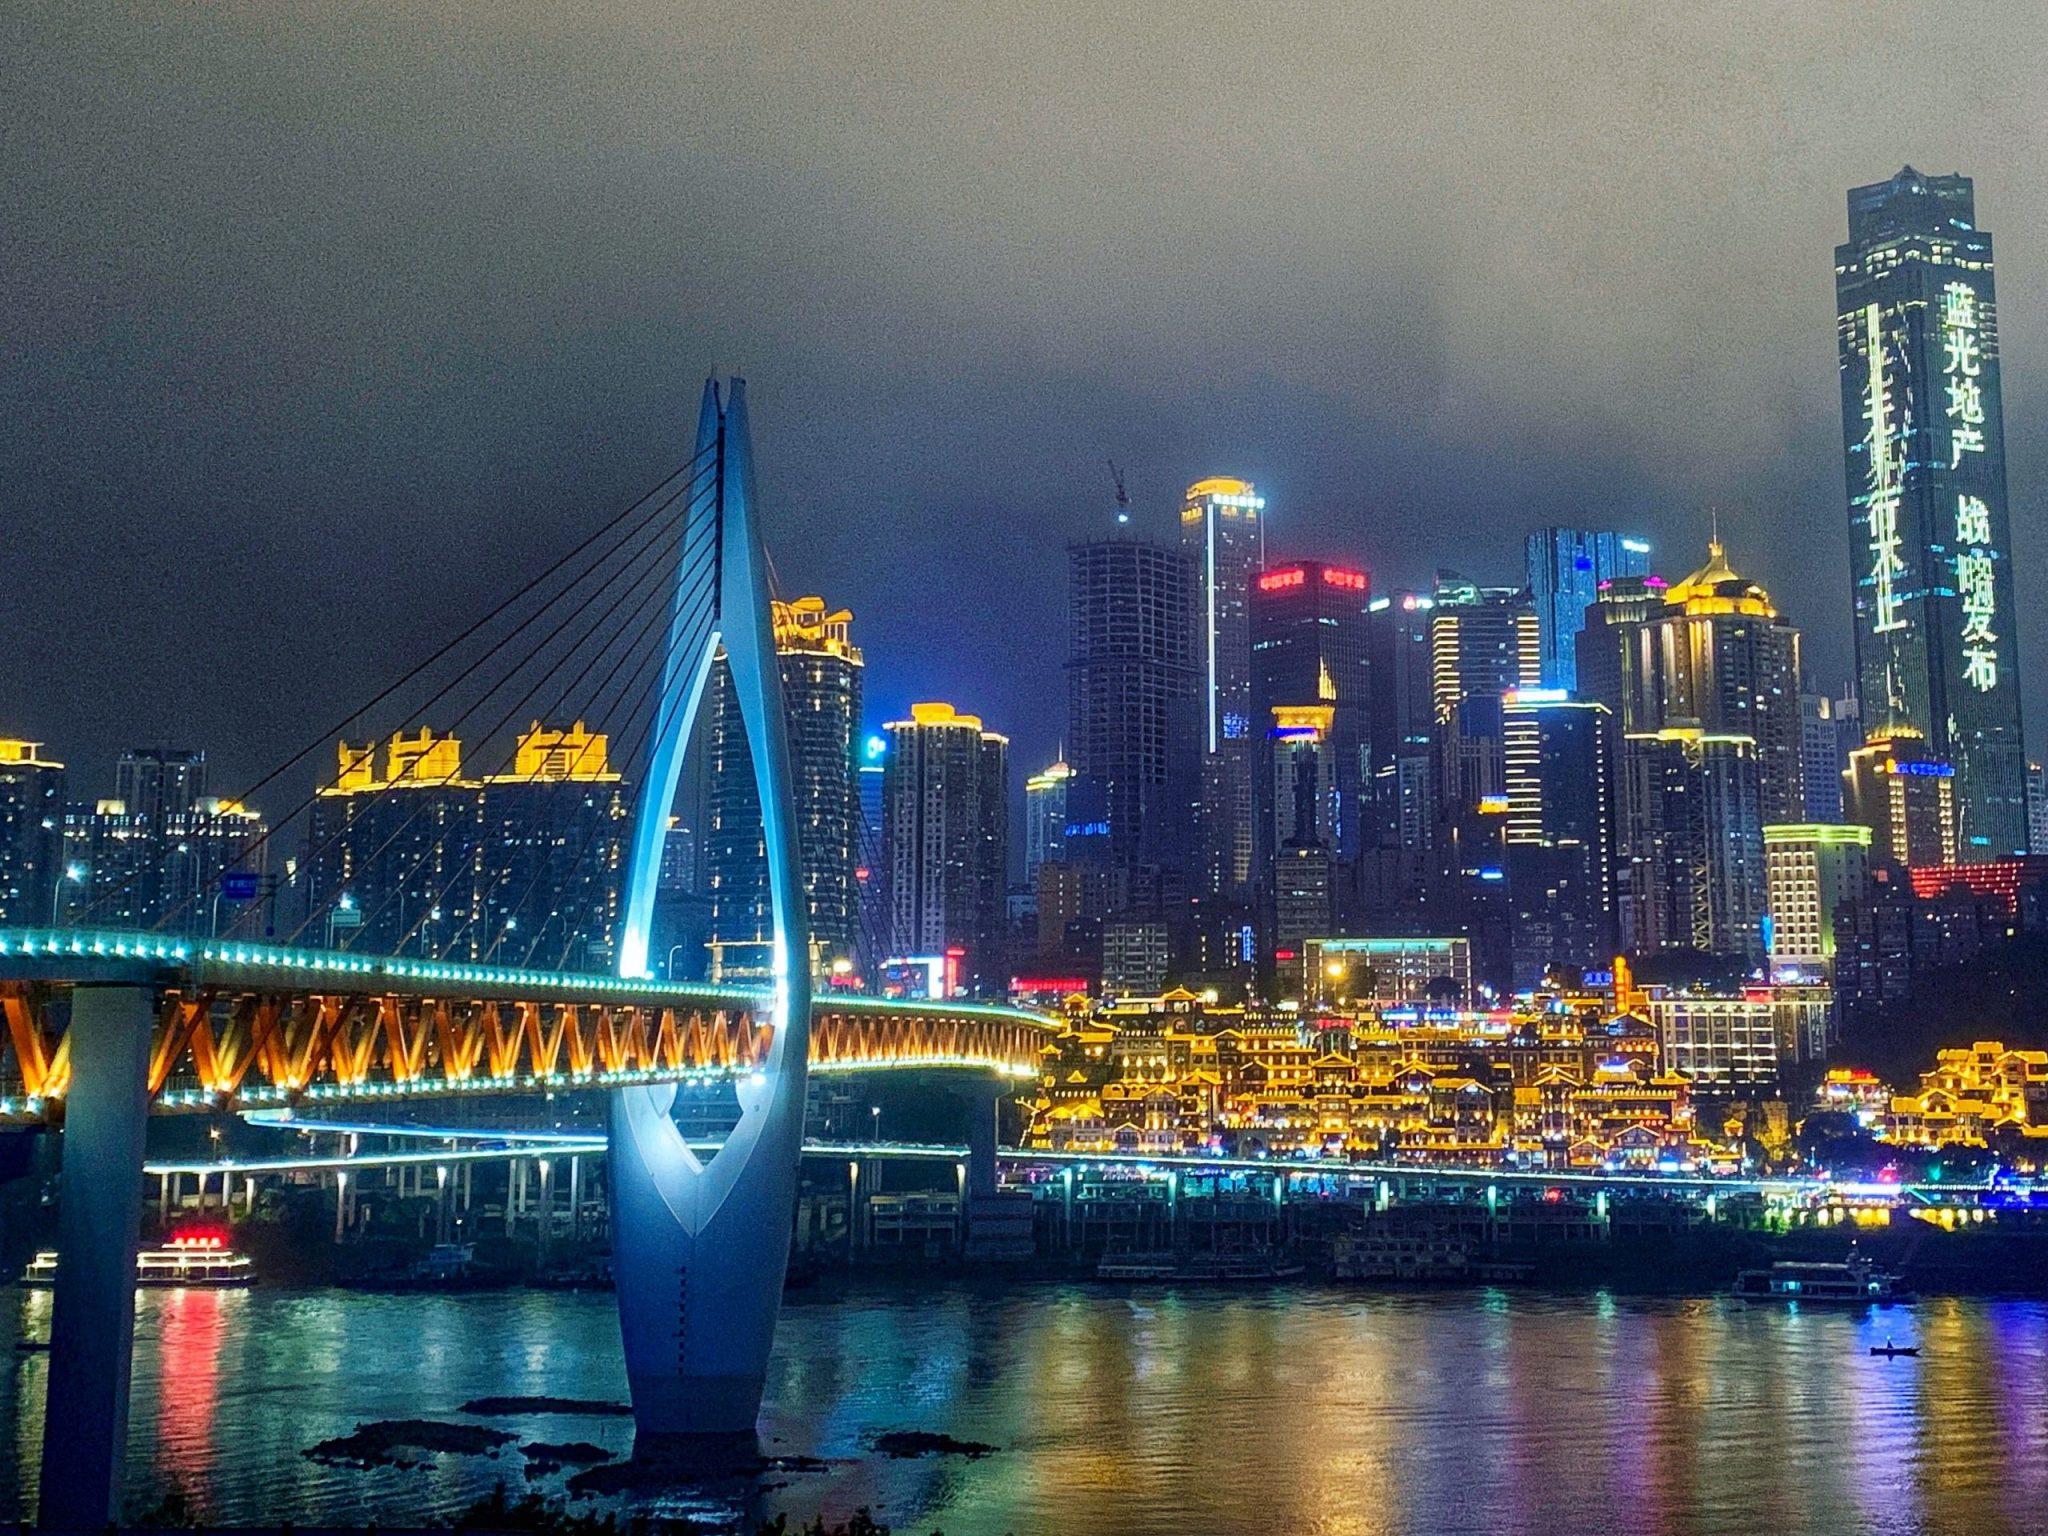 Chongqing bridge